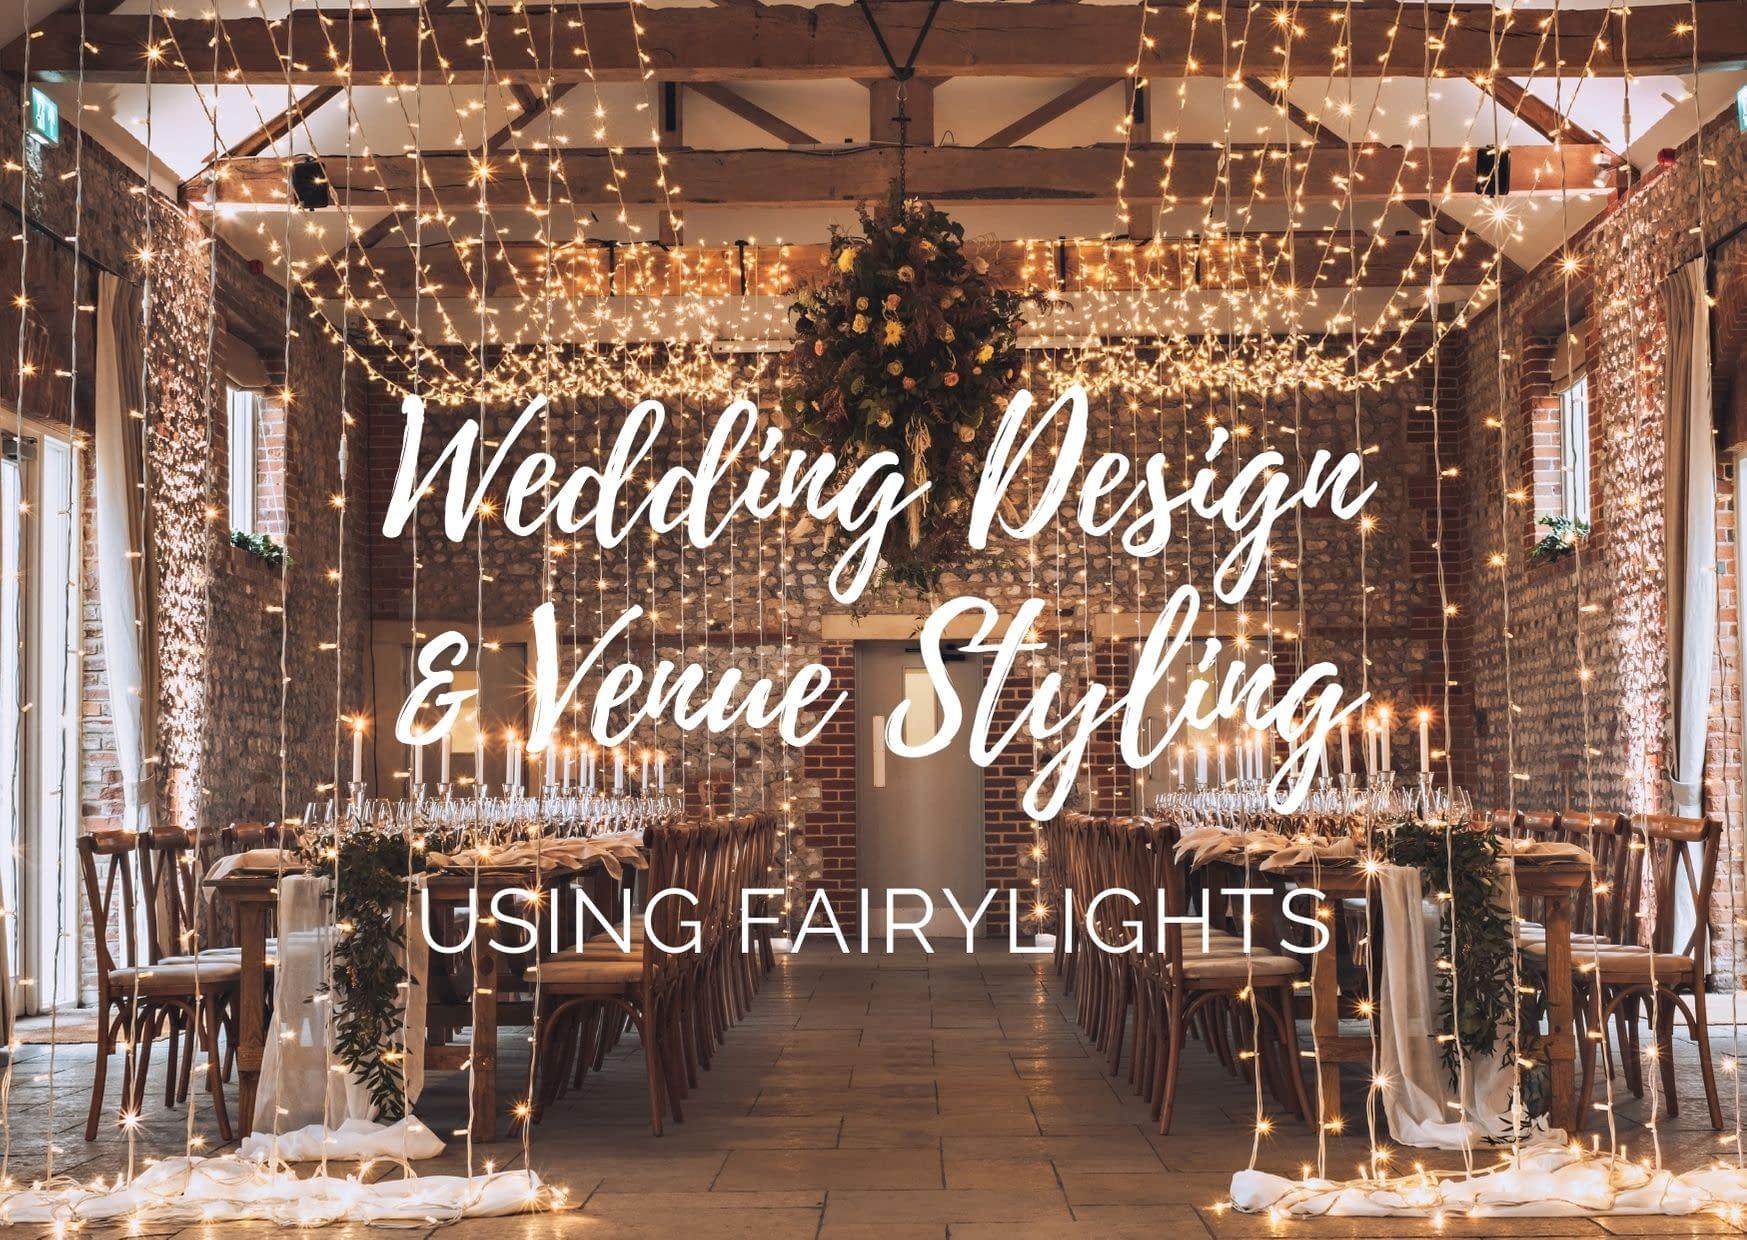 Room styling using fairylights